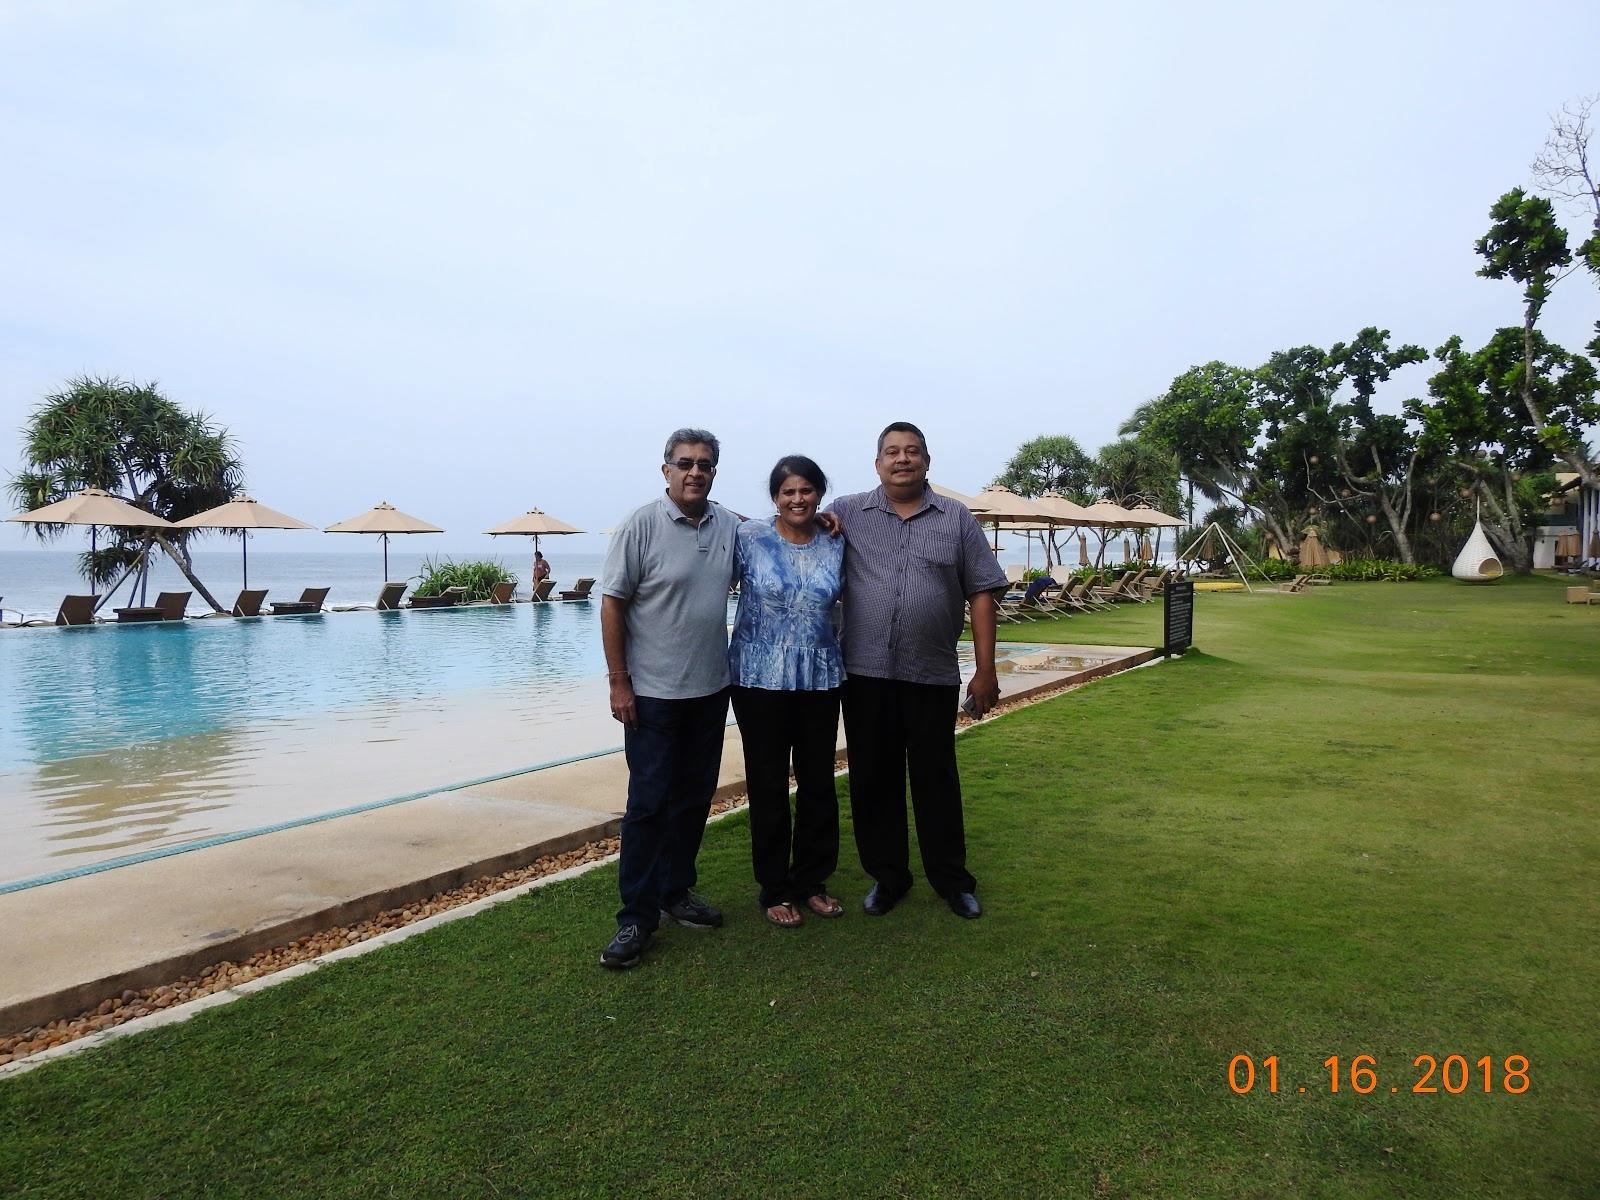 invite-to-paradise-sri-lanka-maldives-holiday-specialists-nutan-vidyut-patel-mohan.jpg